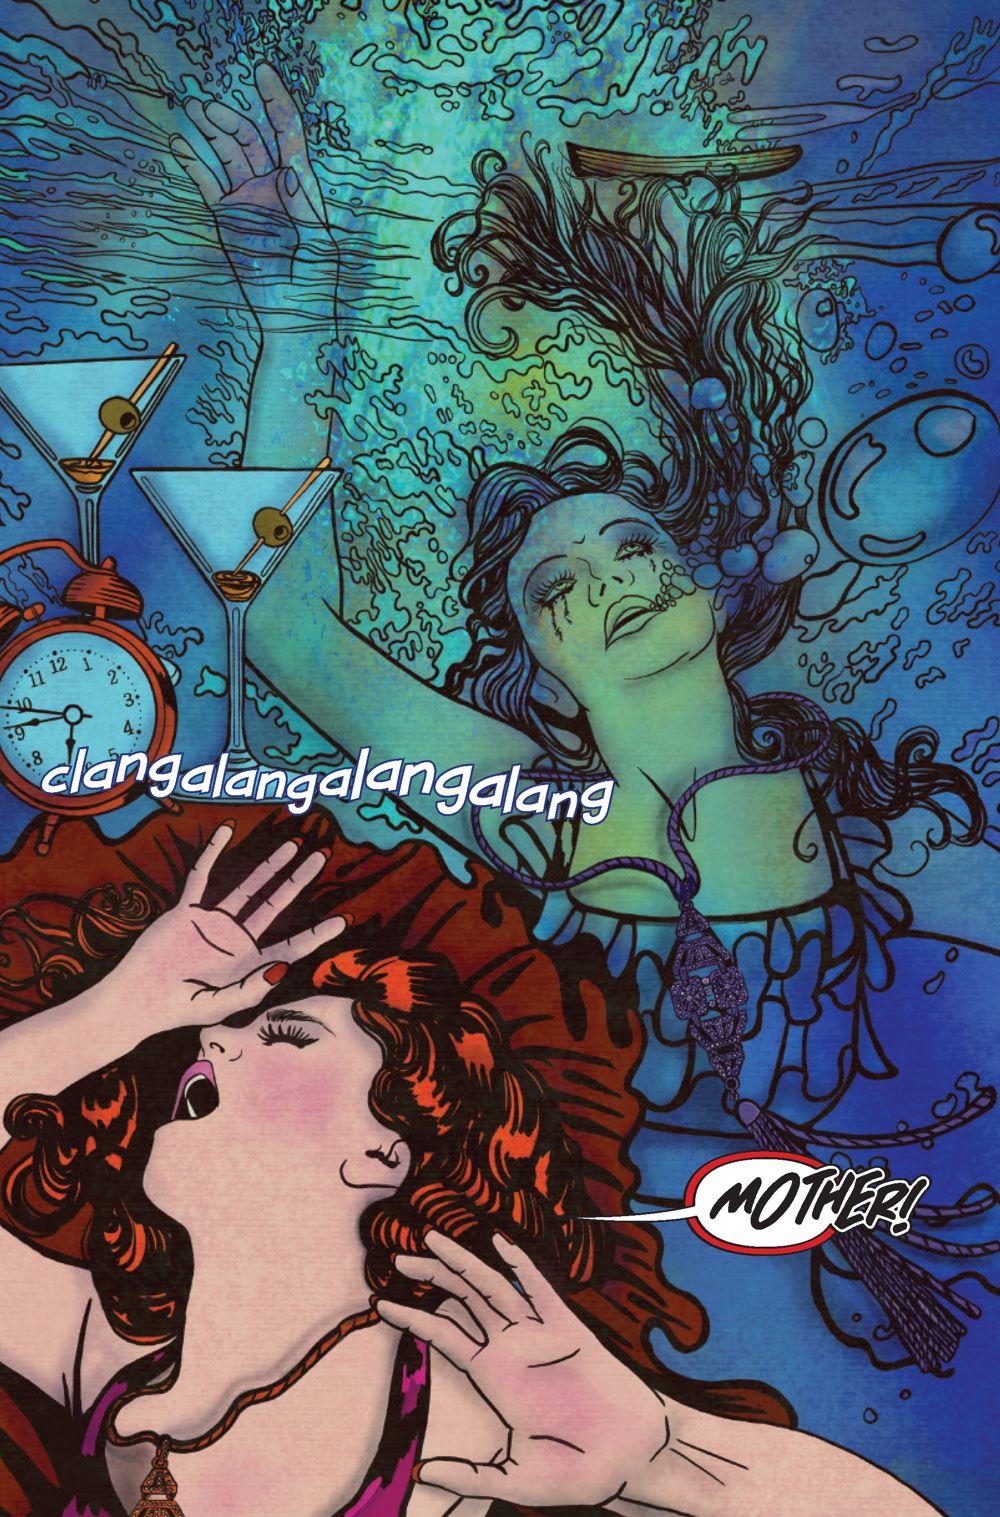 Minky-Woodcock-2-Interiors_Page_3 ComicList Previews: MINKY WOODCOCK THE GIRL WHO ELECTRIFIED TESLA #2